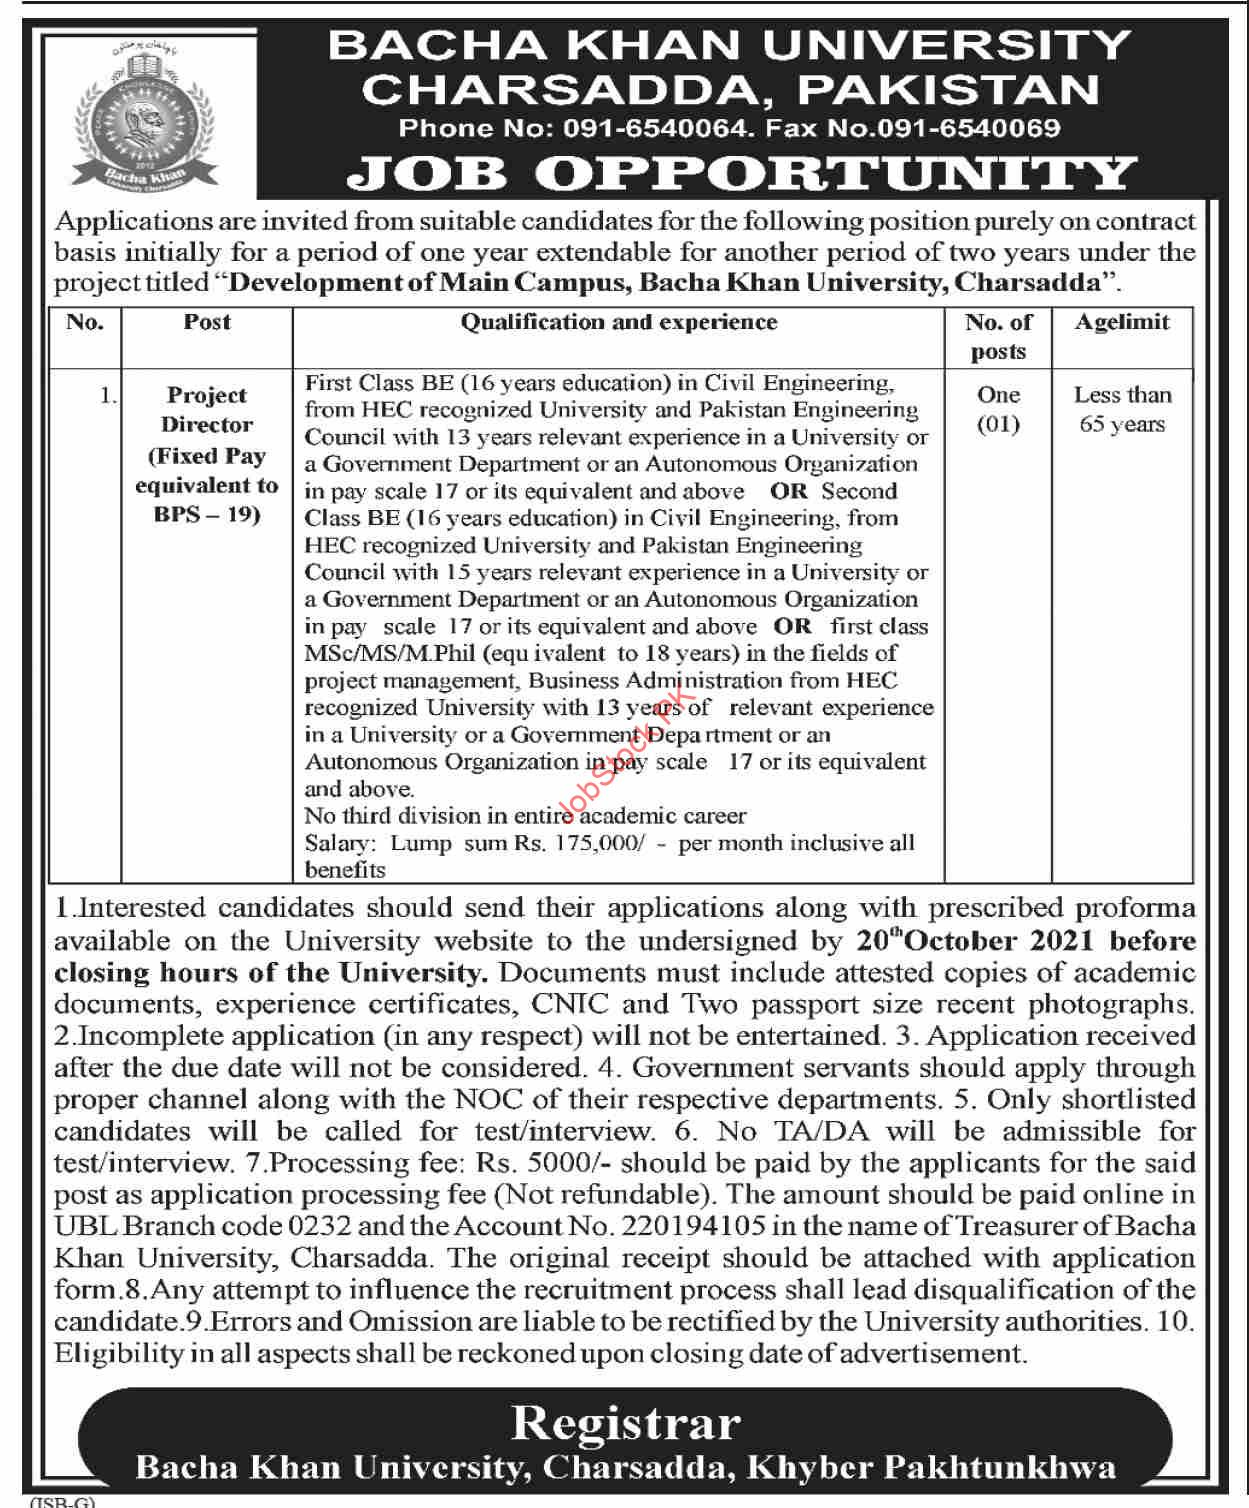 Bacha Khan University Charsadda Pakistan Jobs 2021